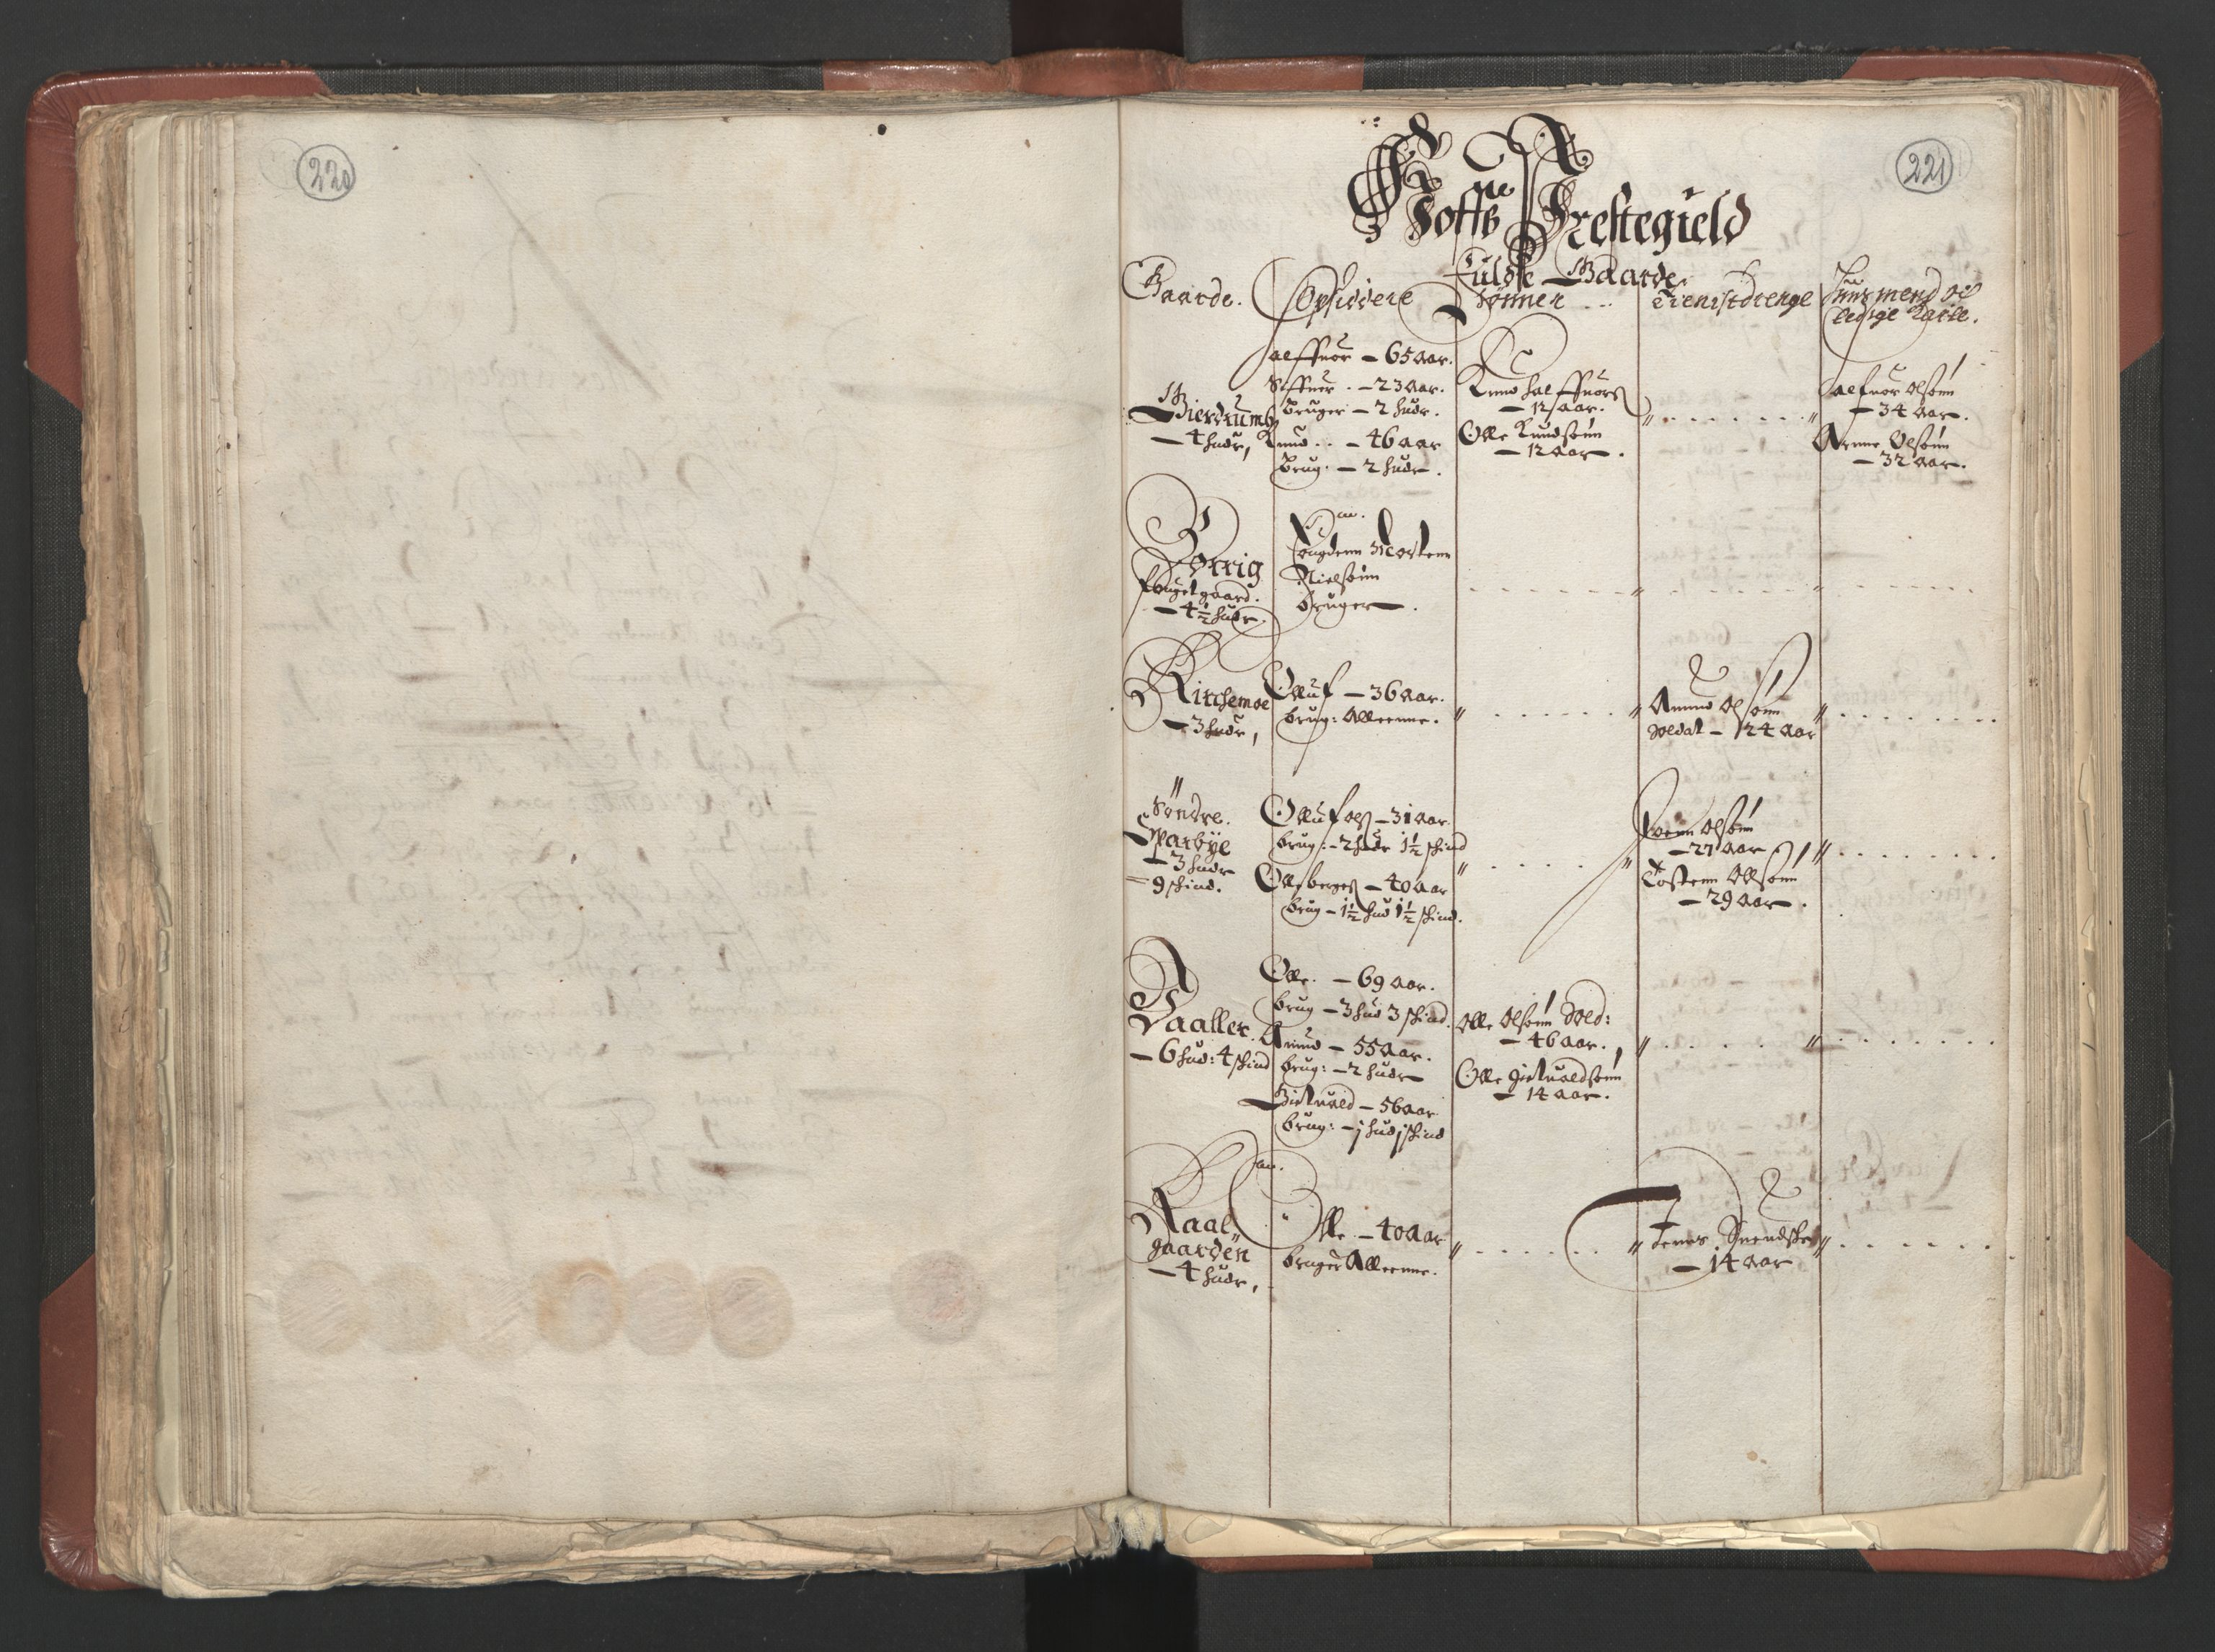 RA, Fogdenes og sorenskrivernes manntall 1664-1666, nr. 3: Hedmark fogderi og Solør, Østerdal og Odal fogderi, 1664, s. 220-221